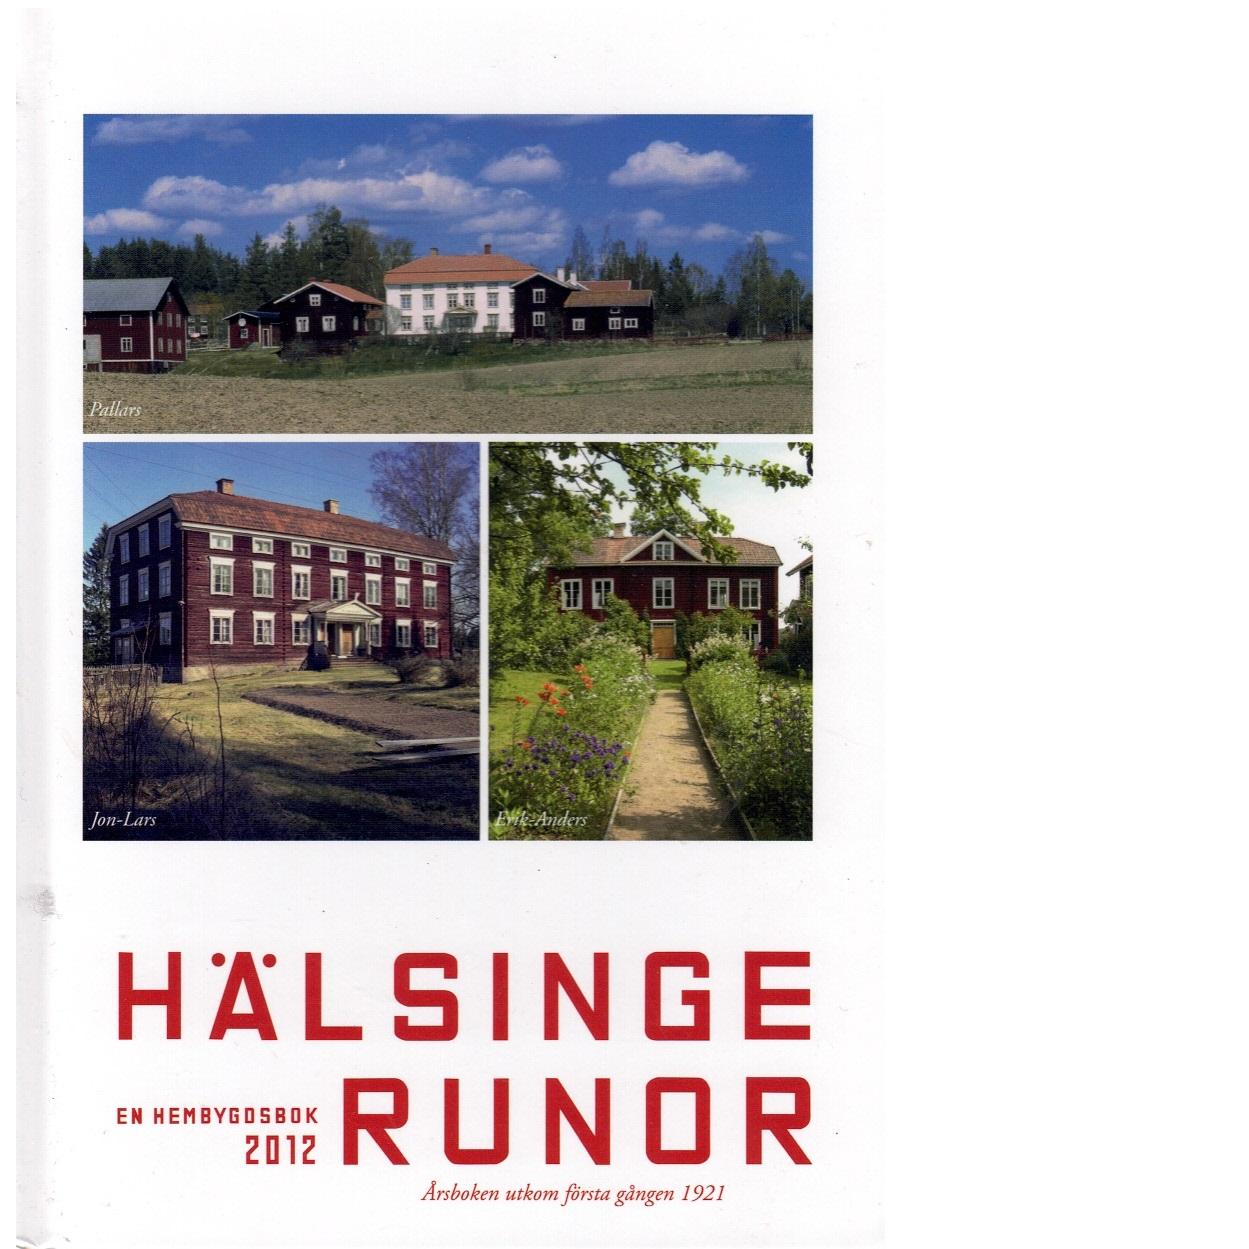 Hälsingerunor 2012 - Red.